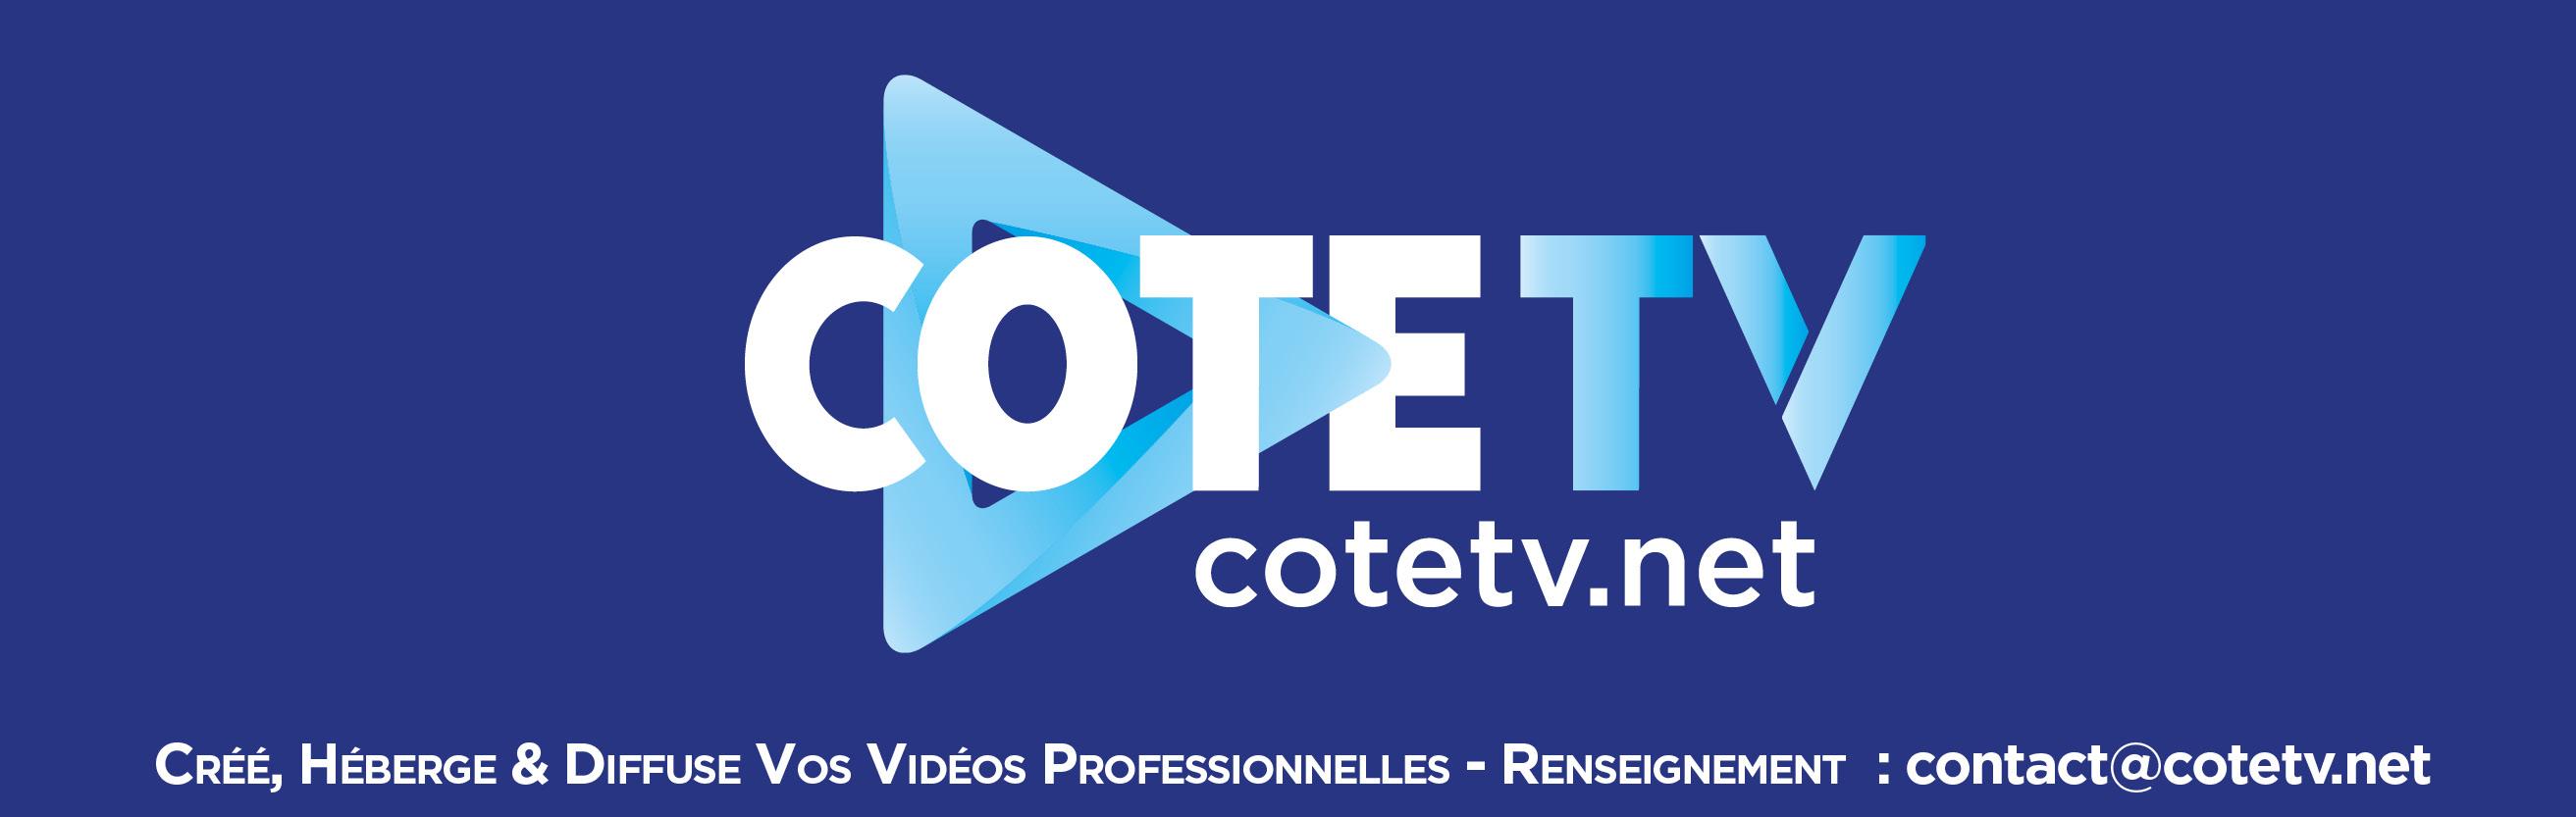 cote-tv_autopromo web2.jpg